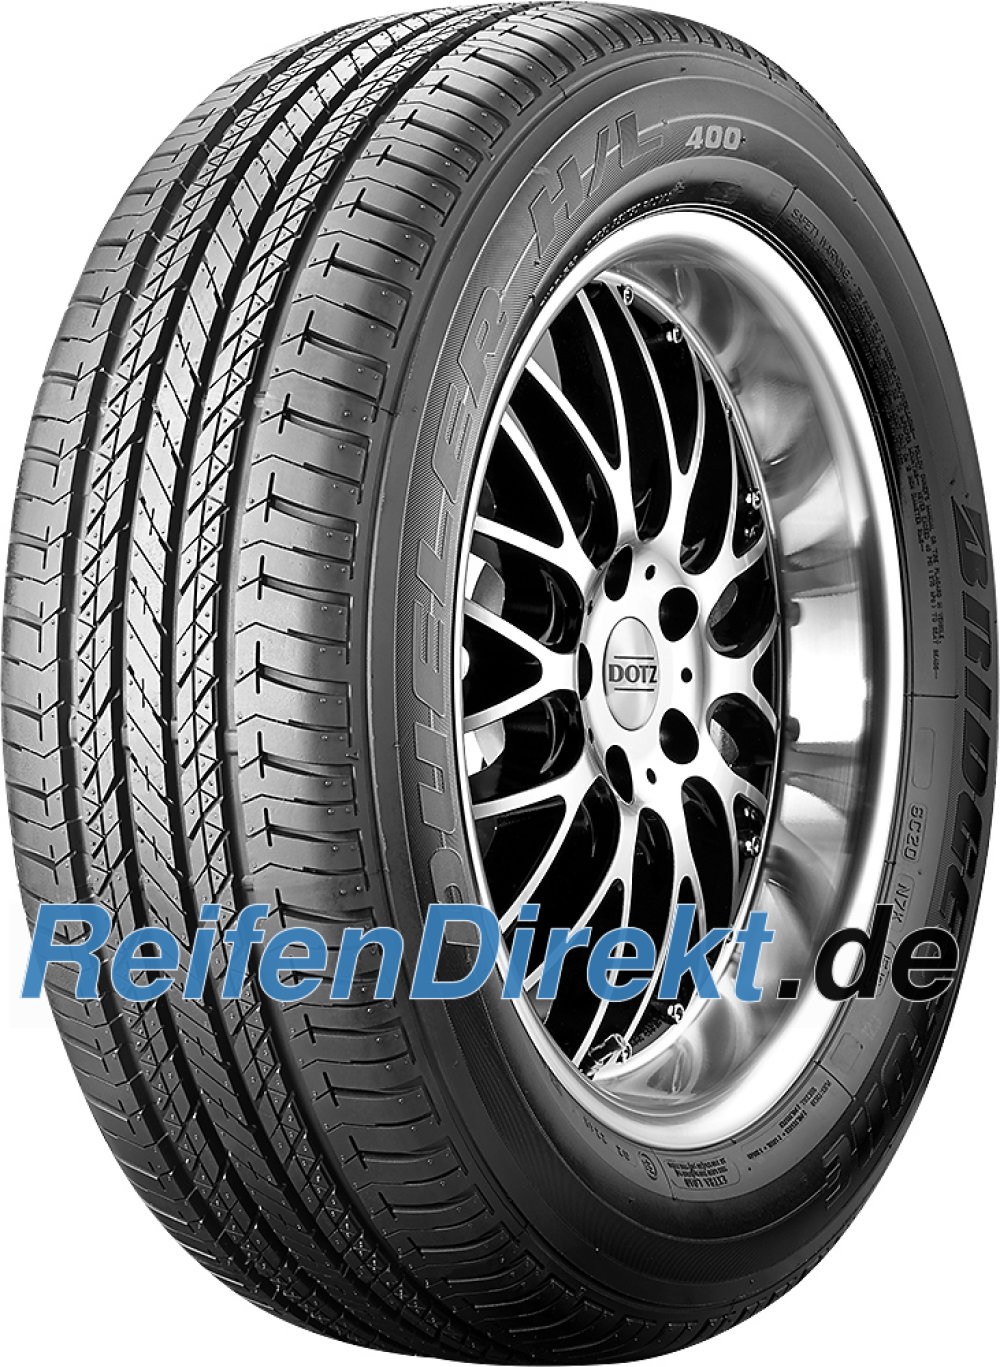 Bridgestone Dueler H/L 400 ( 205/60 R16 96T XL )